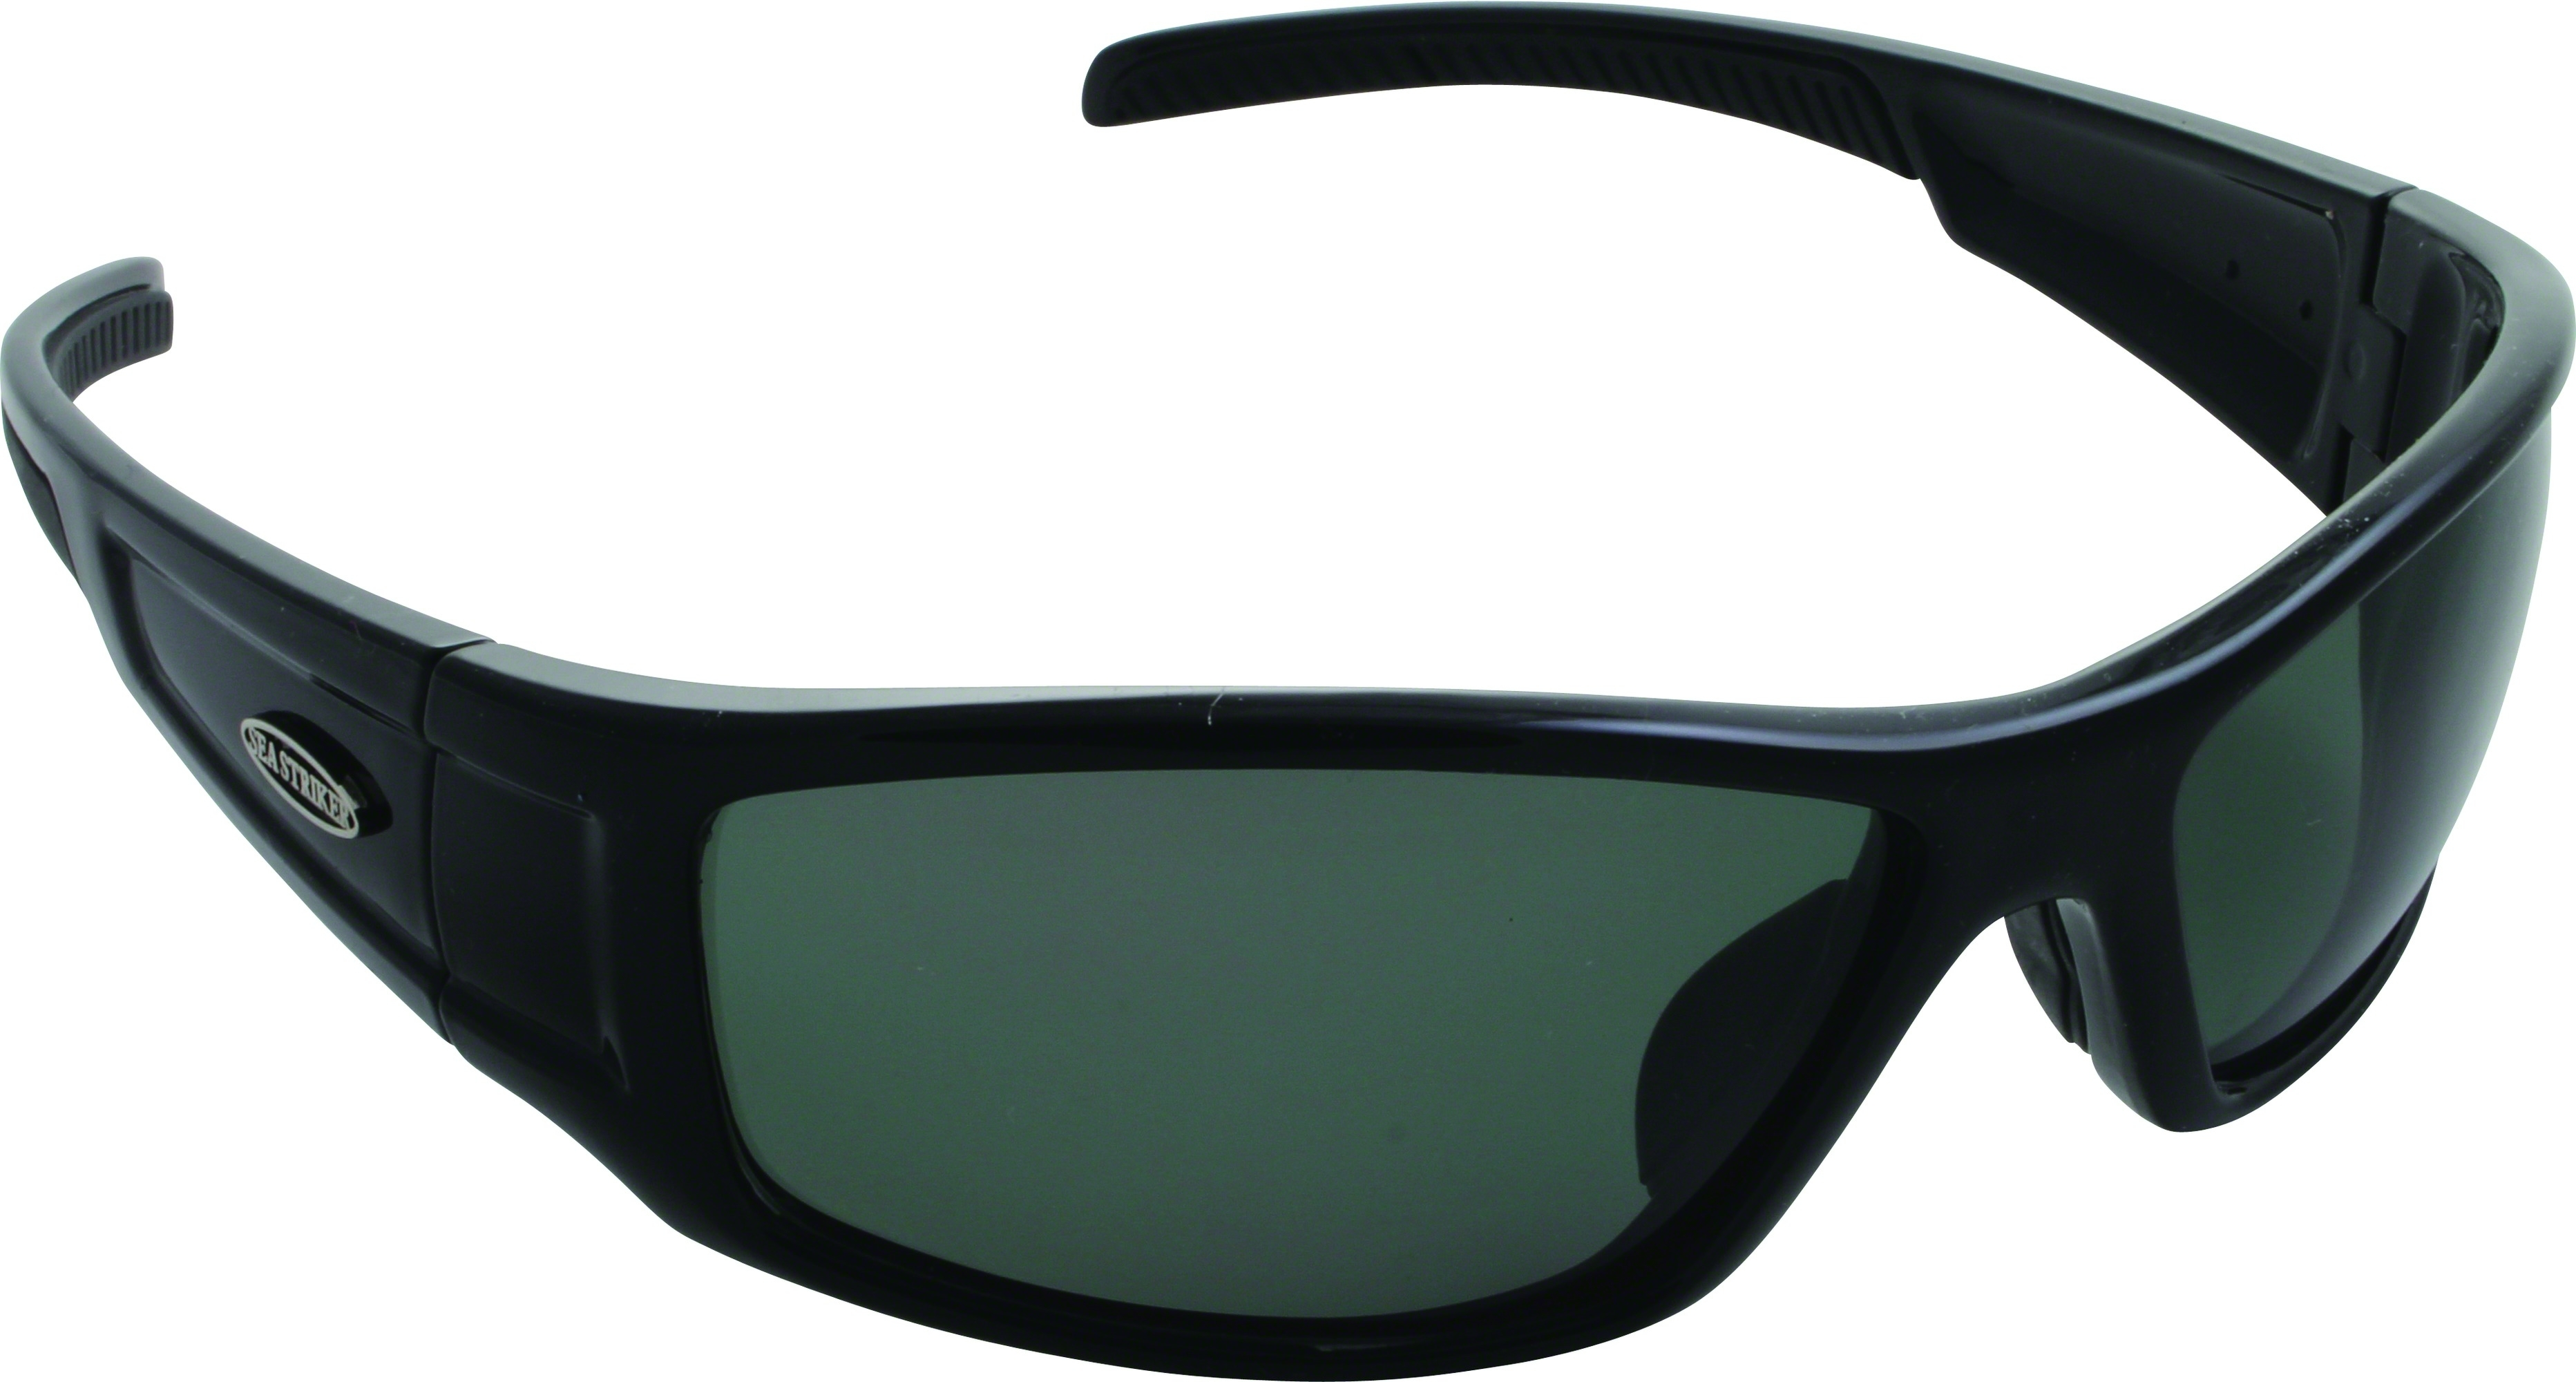 d8375fd3afb4 Details about Sea Striker 287 Sea Star Sunglasses Black Grey Lenses  Polarized